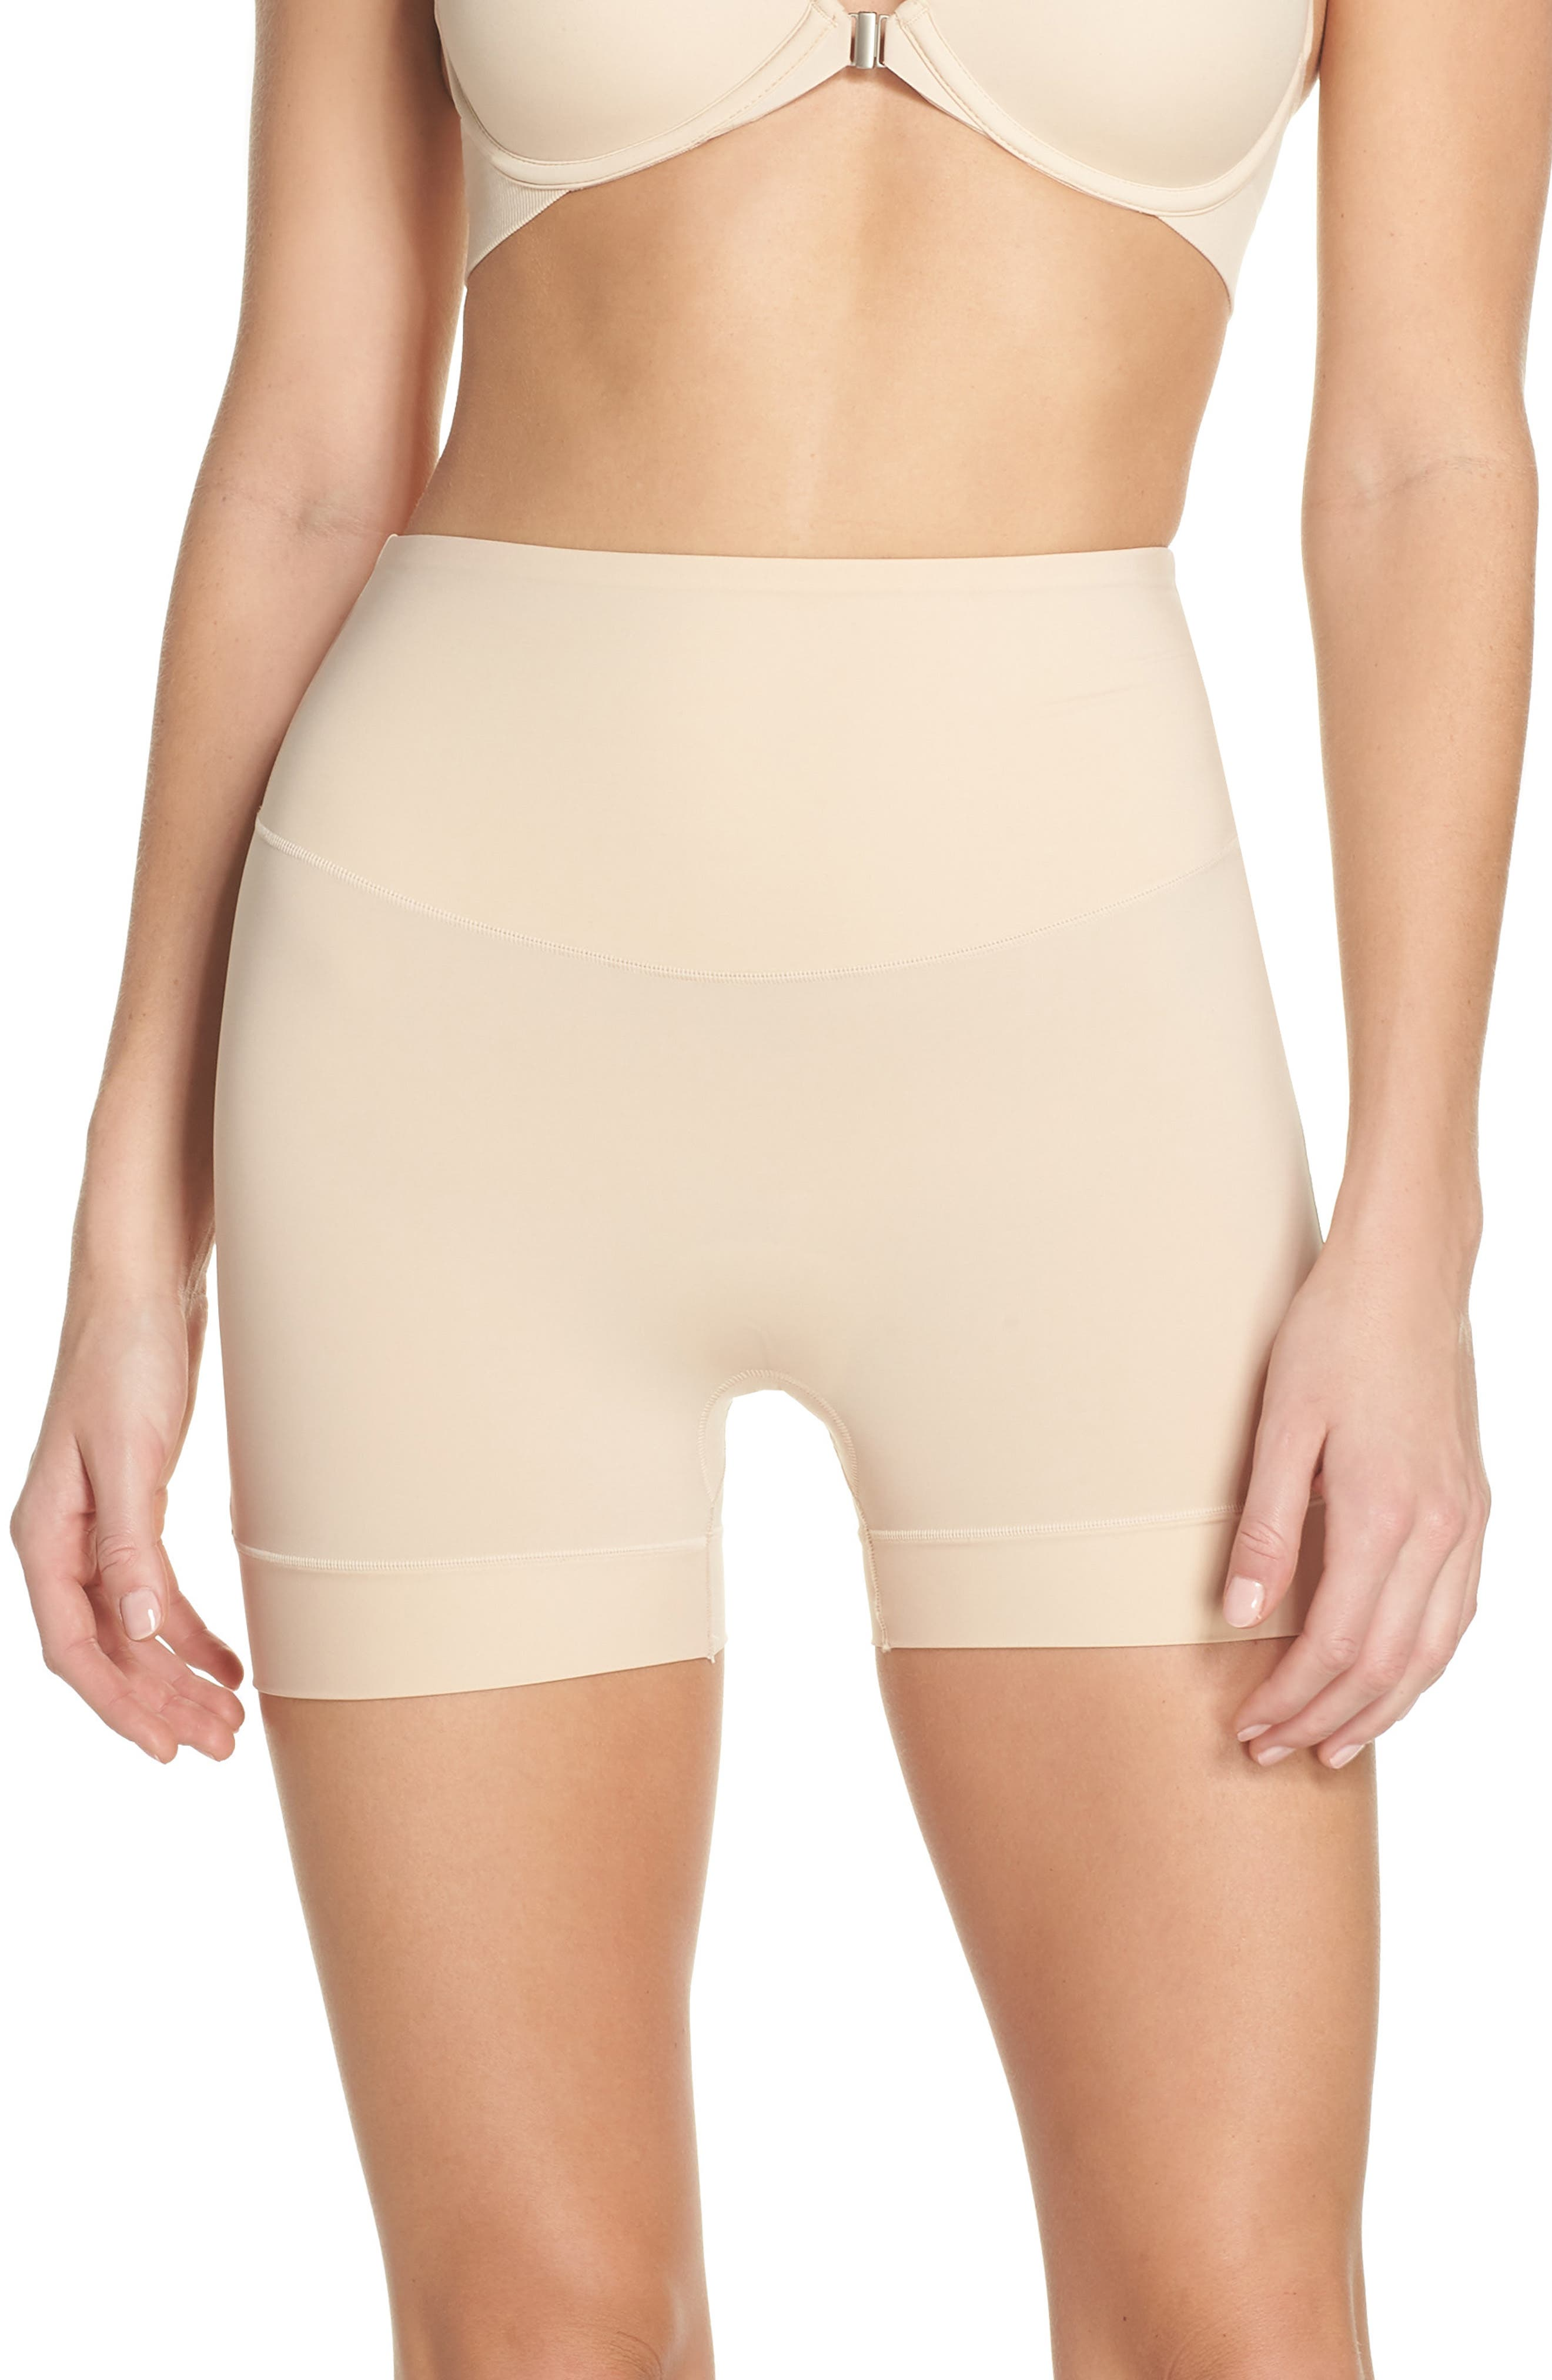 Tummie Tamers Mid Waist Shaping Shorts,                             Main thumbnail 1, color,                             Frappe